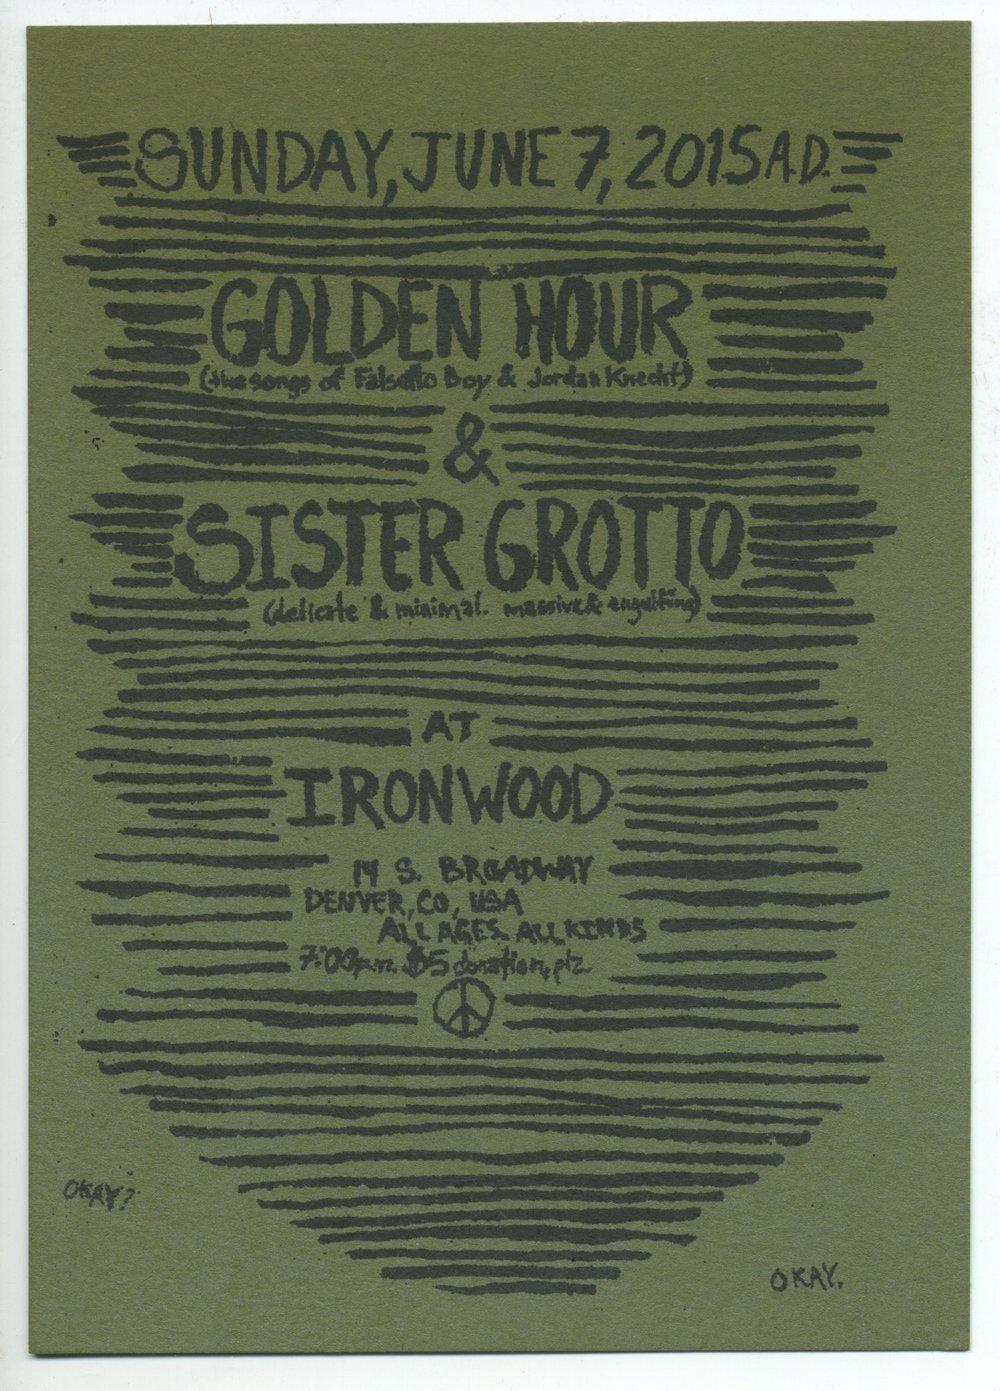 Sister Grotto Flier.jpeg